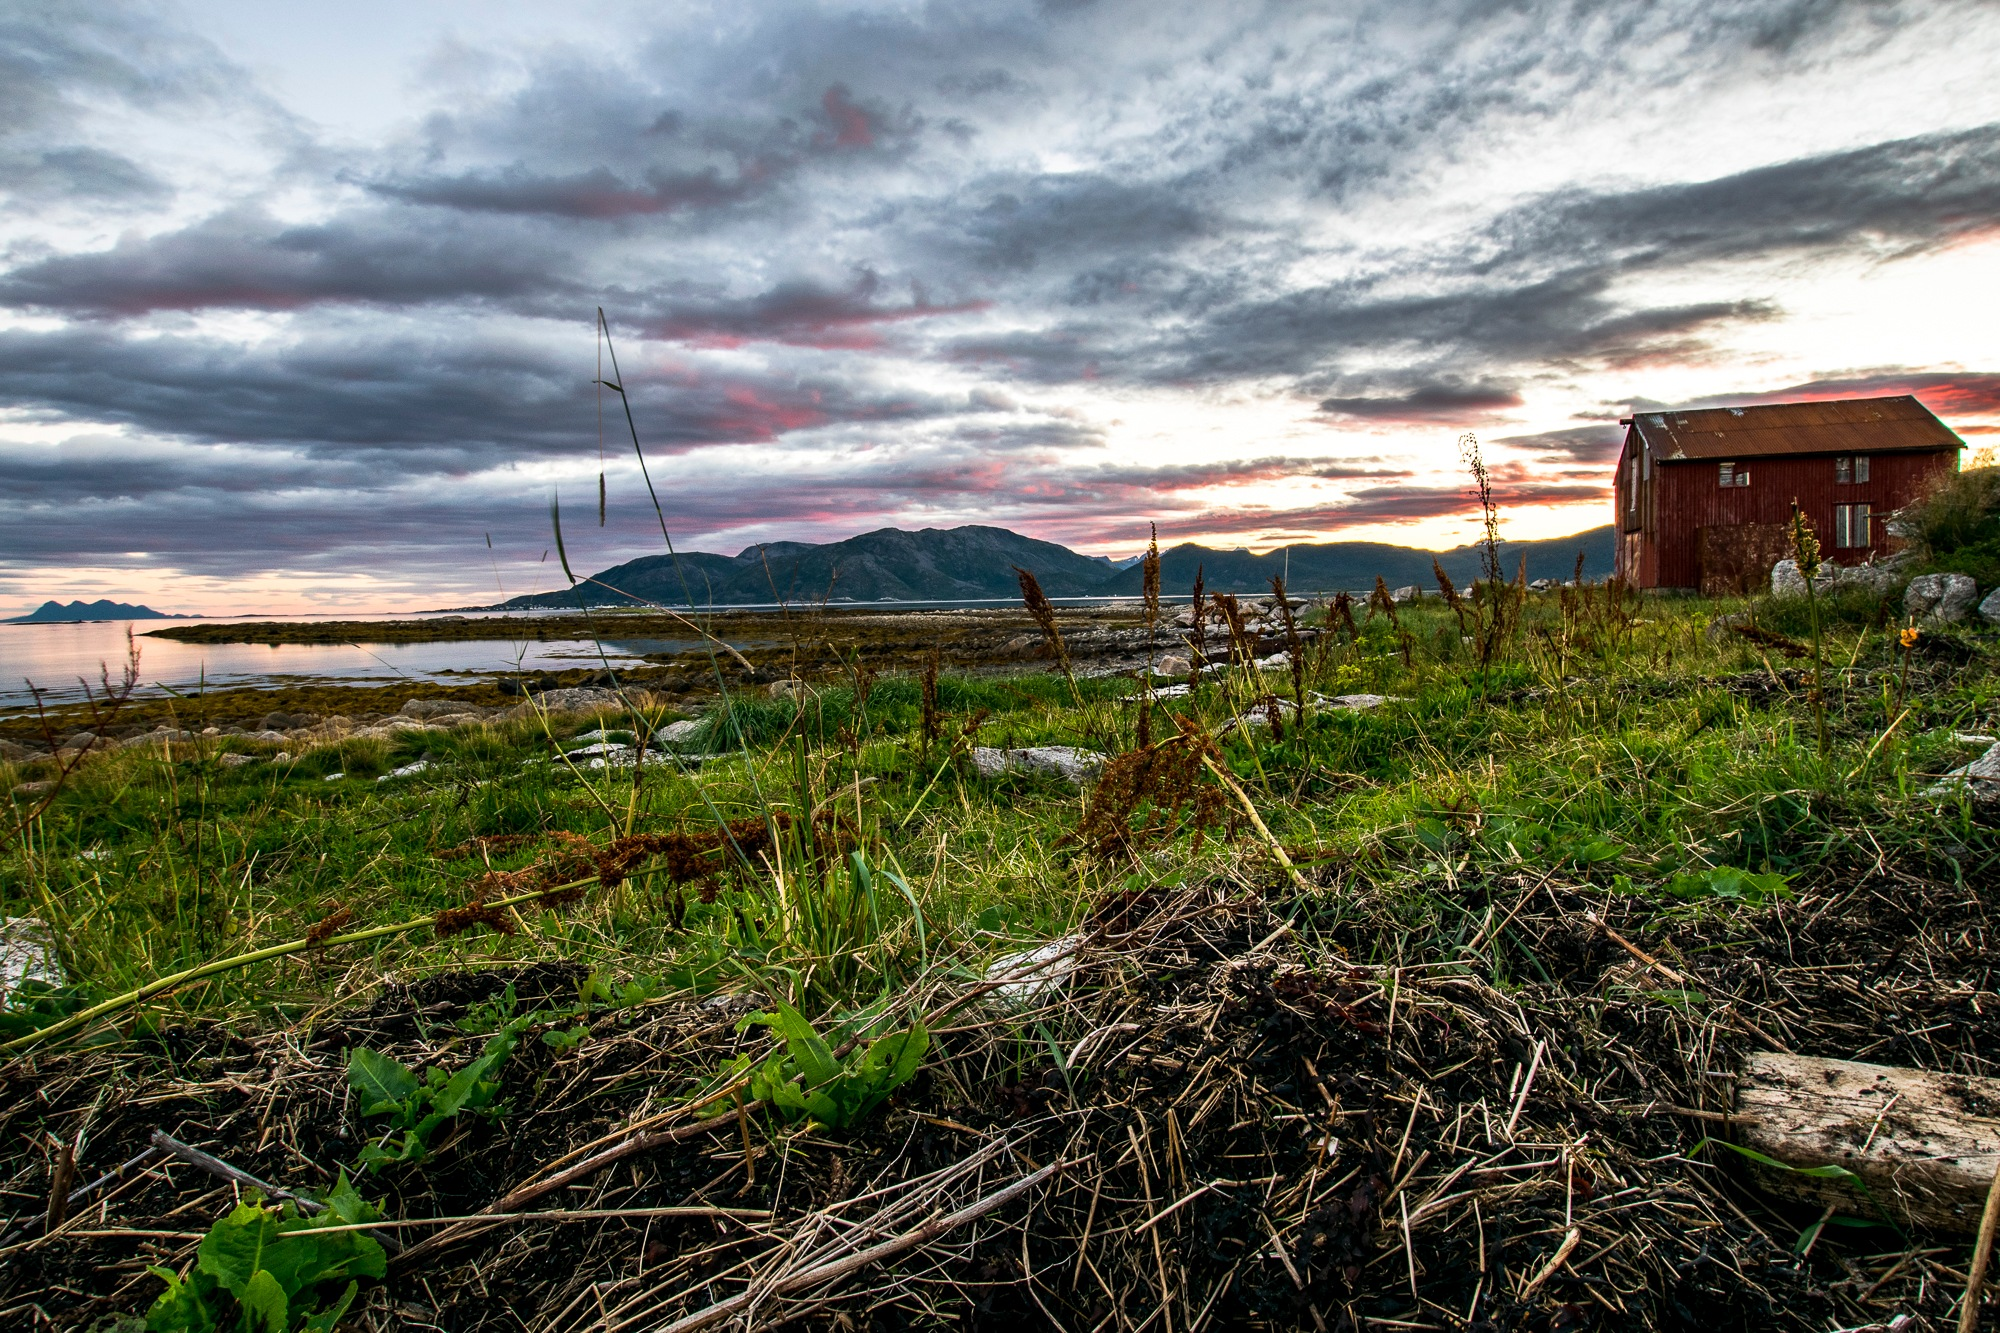 Kjerstad, Tjeldøya, Nordland, Norway by Roman Rogner